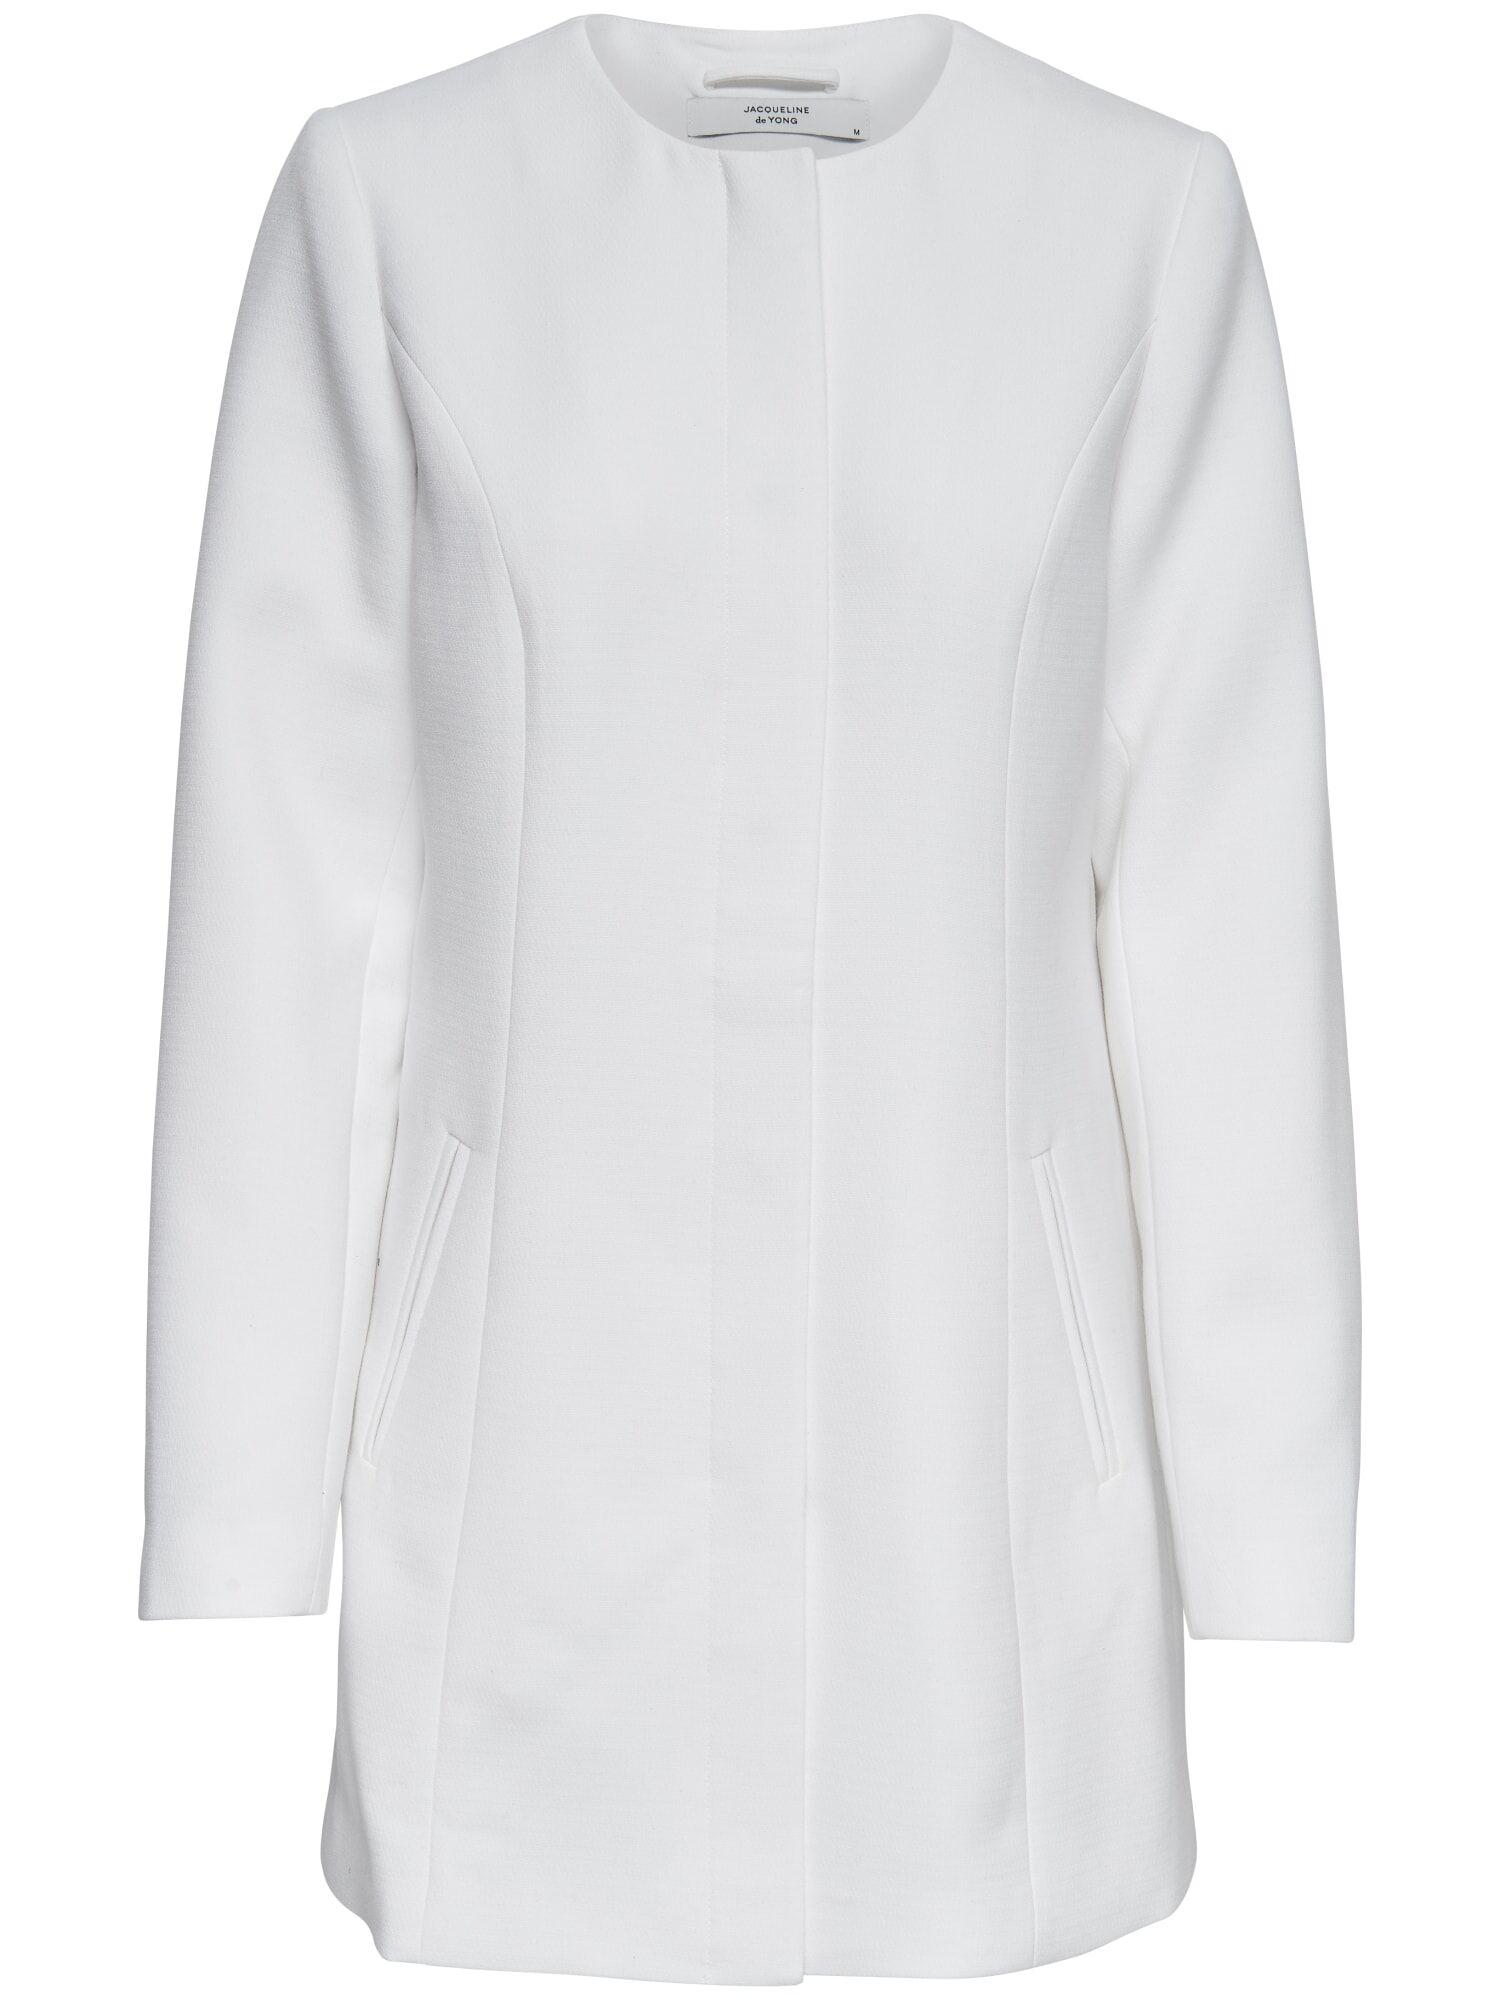 JACQUELINE DE YONG JdY New Brighton naisten takki